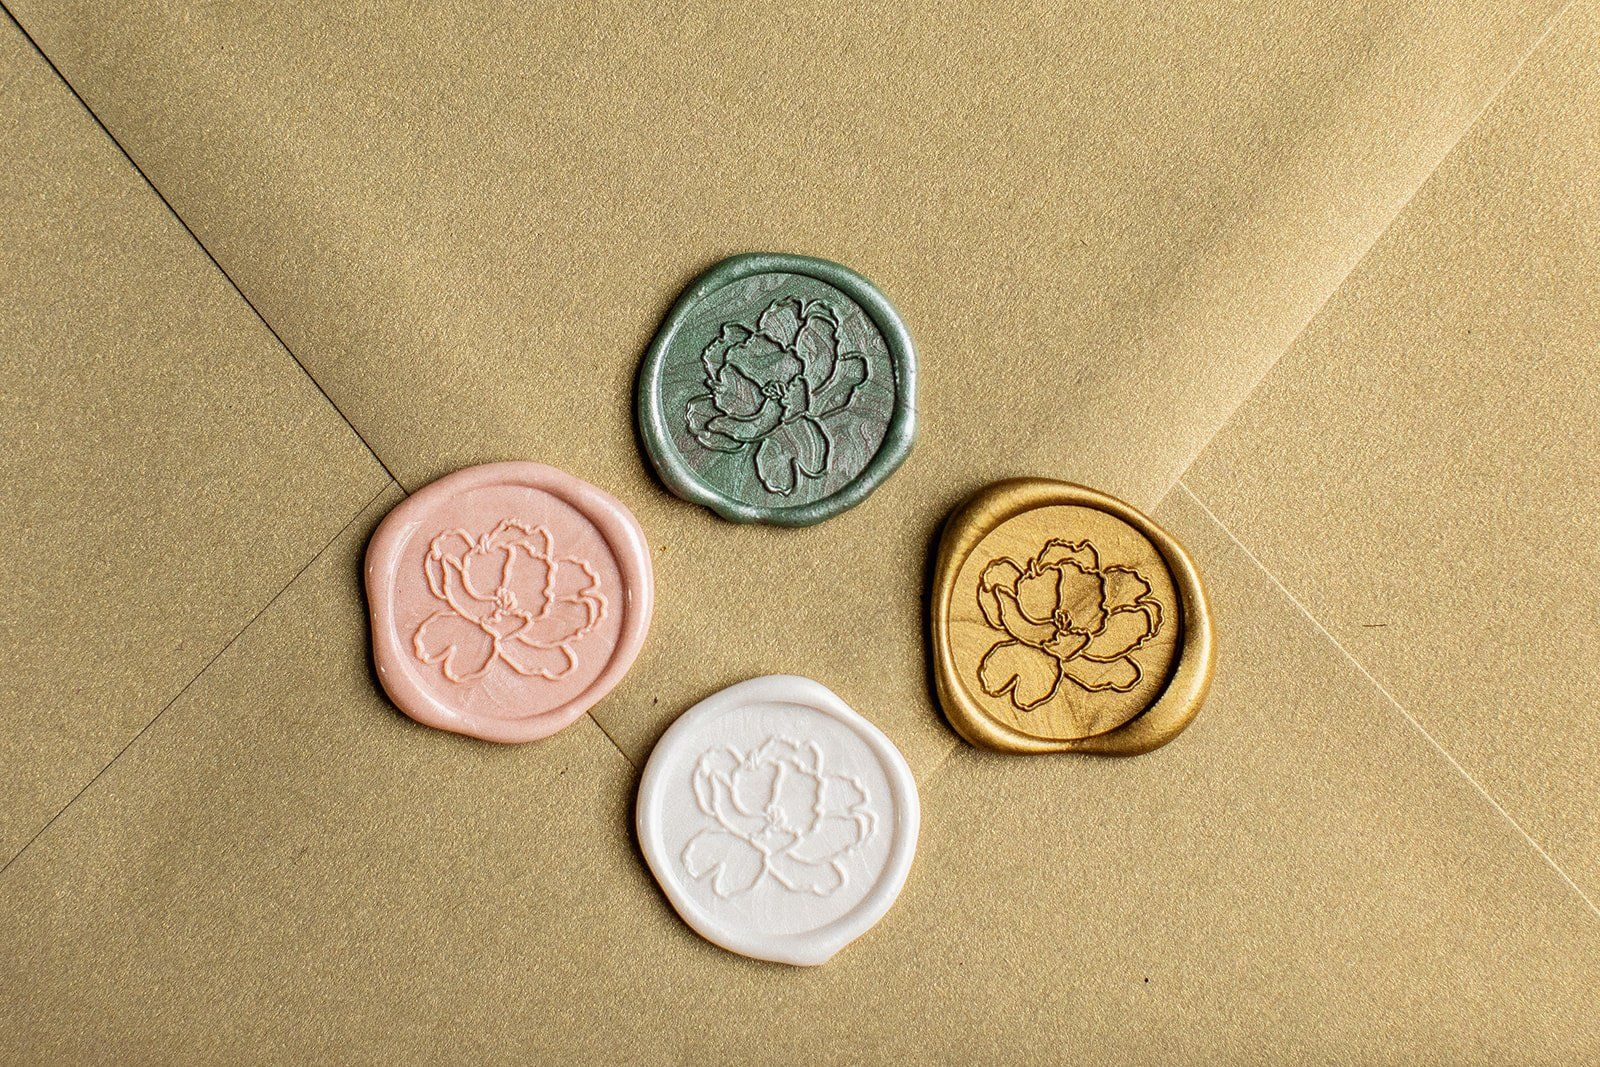 DIY Wax Seal Kit PLUS Envelope Flower Wax Seal with a White Metallic Mailing Envelope Self Adhesive Wax Seals